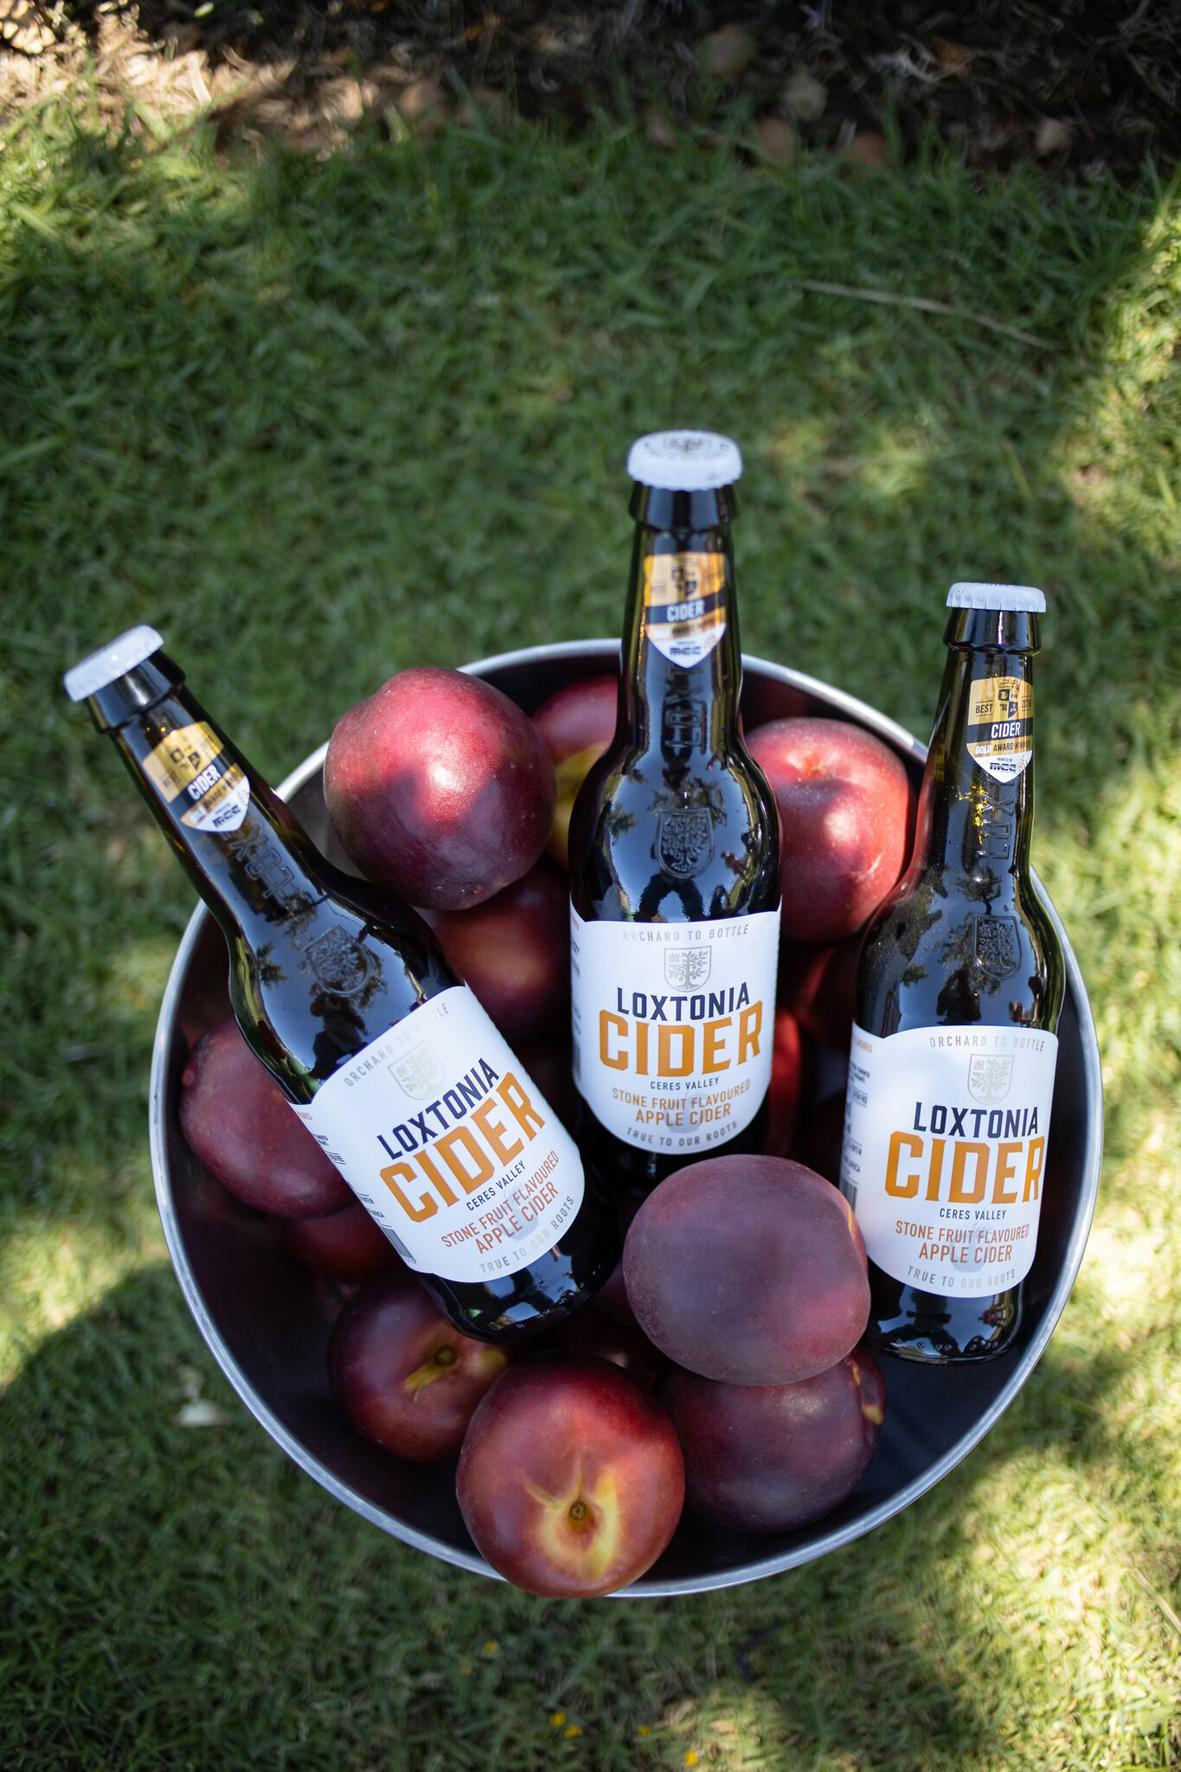 Loxtonia Cider